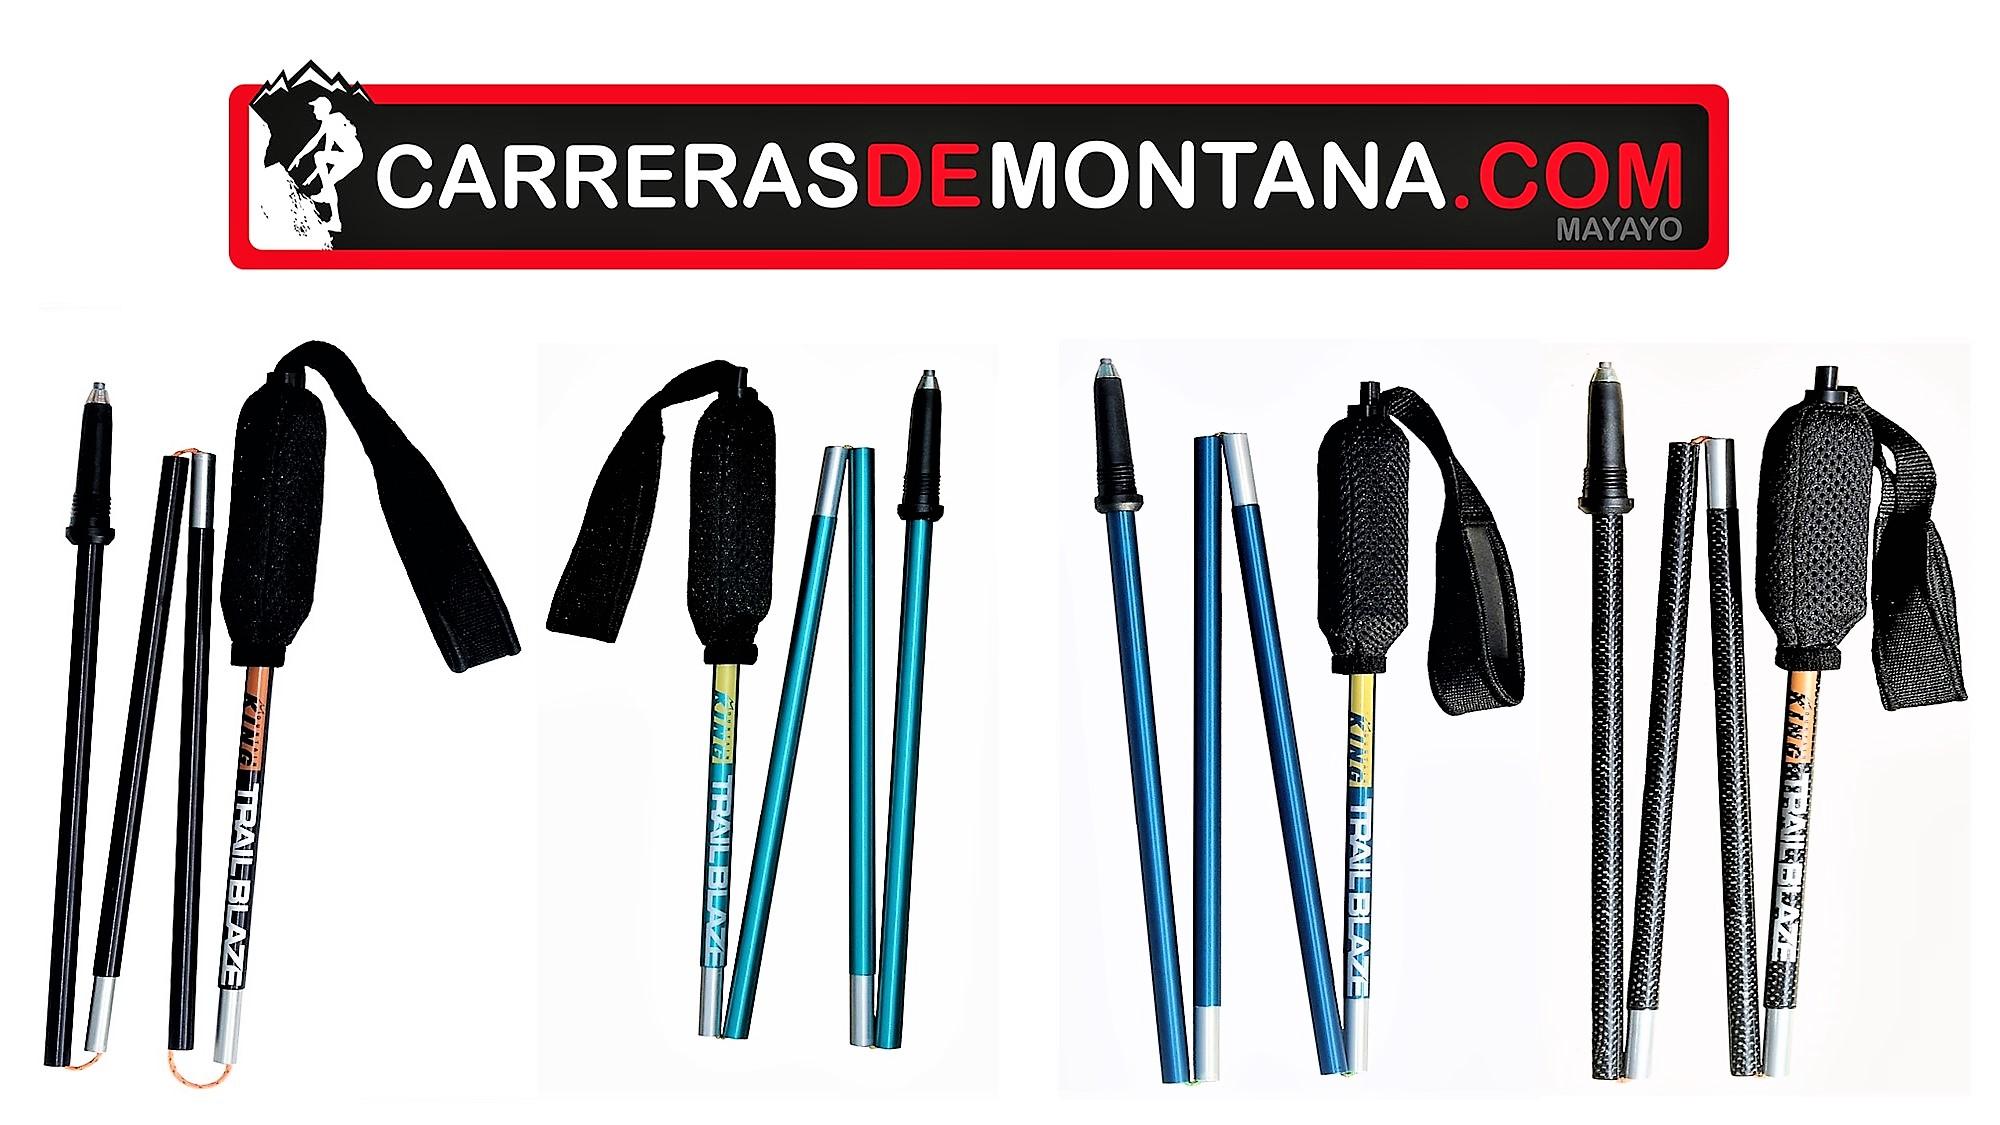 Mountain King trail Blaze poles: Bastones ligeros para trail running y ultra trail Análisis técnico y alternativas por Mayayo.